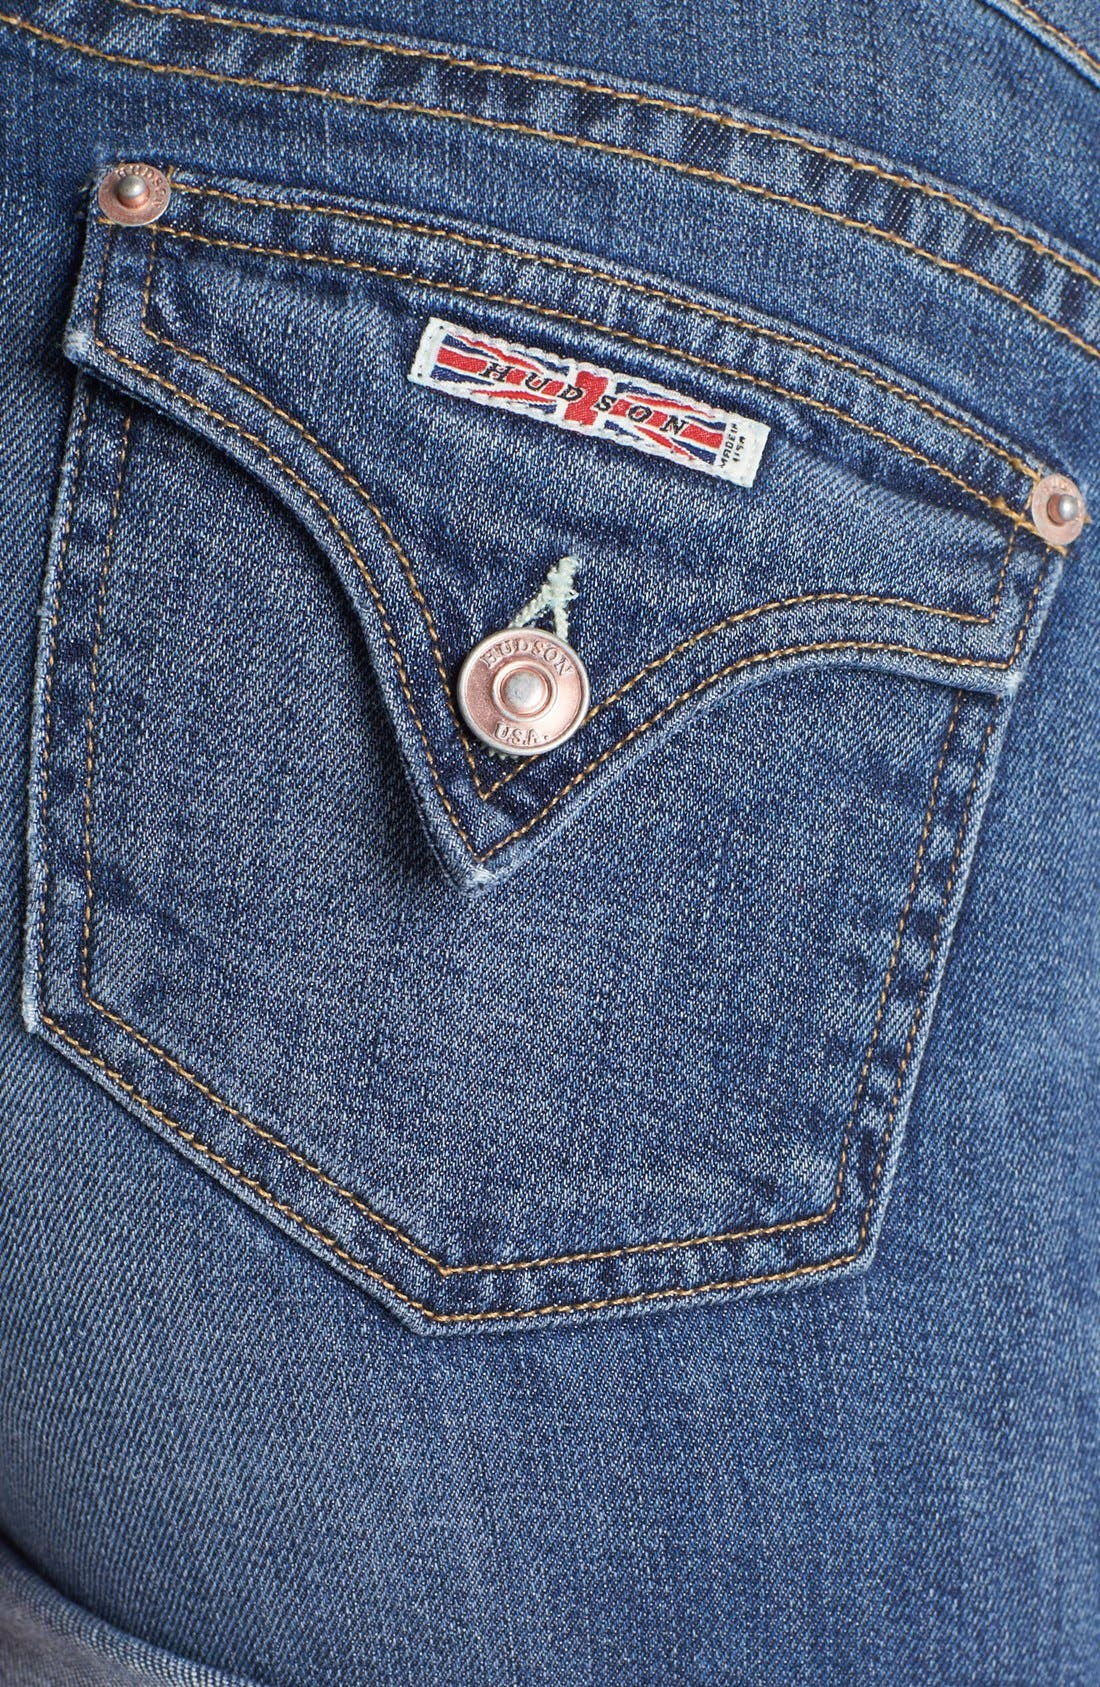 Cuff Denim Shorts,                             Alternate thumbnail 3, color,                             420